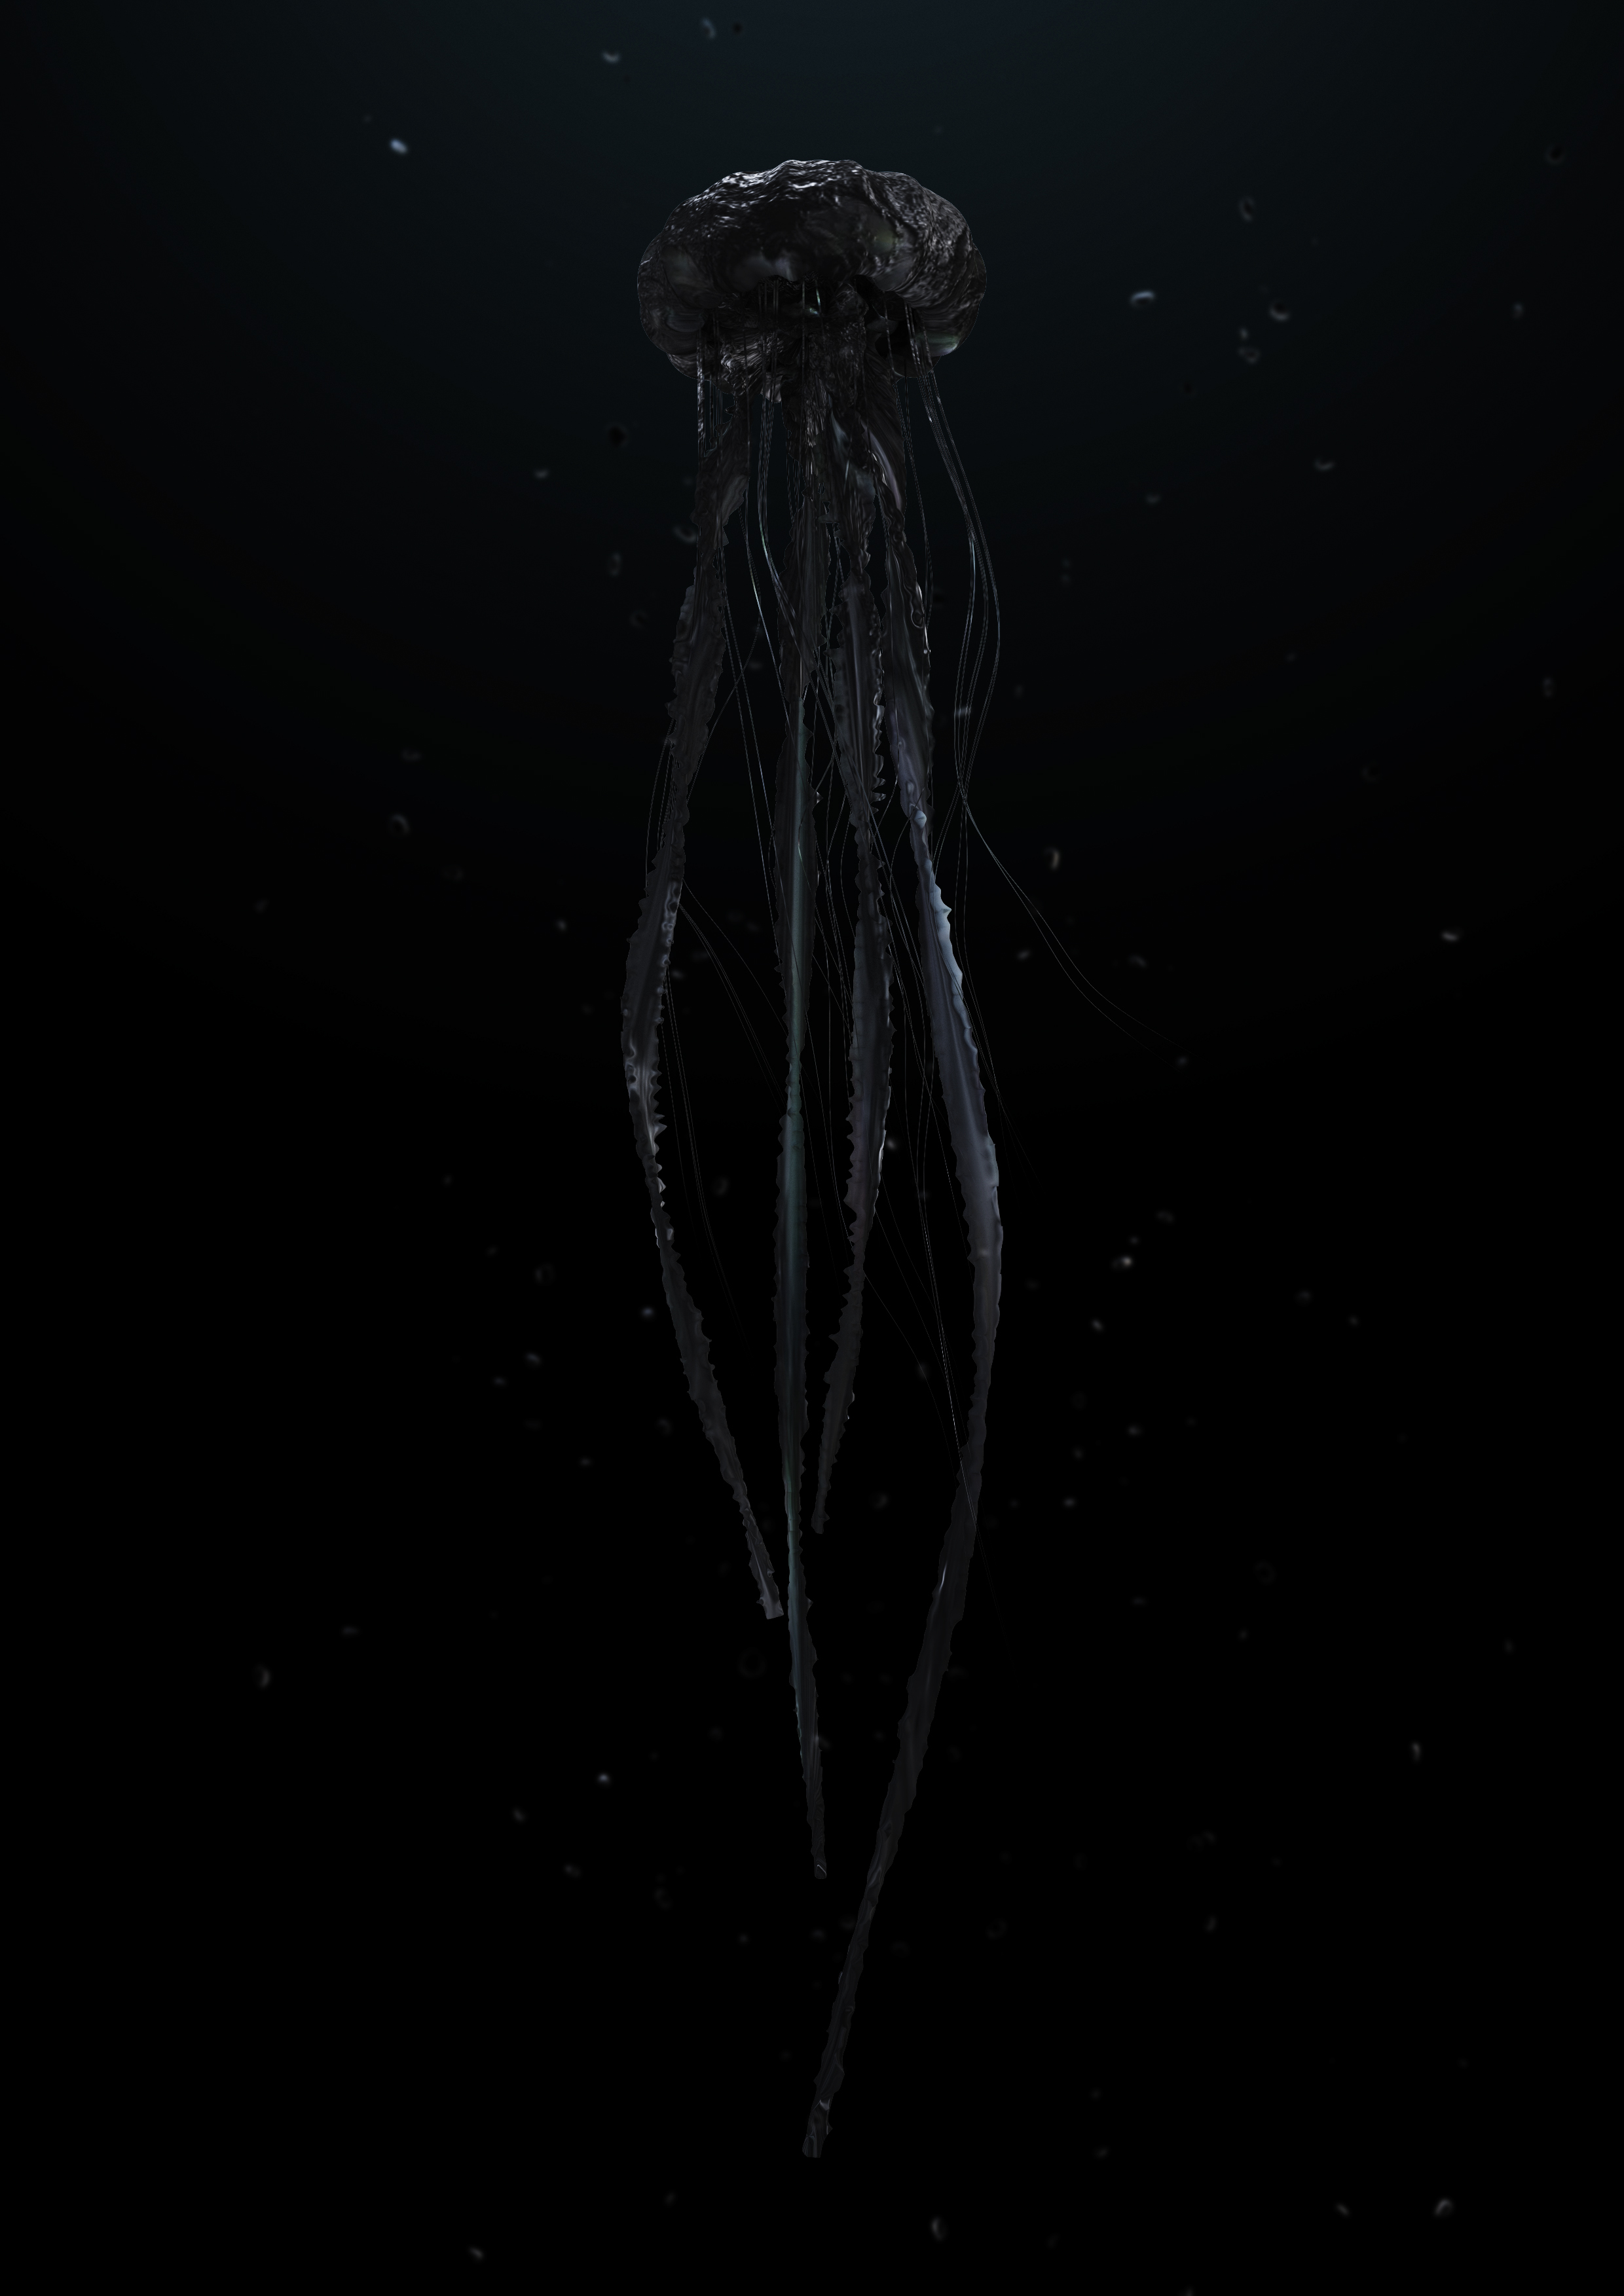 160530_Jellyfish-black